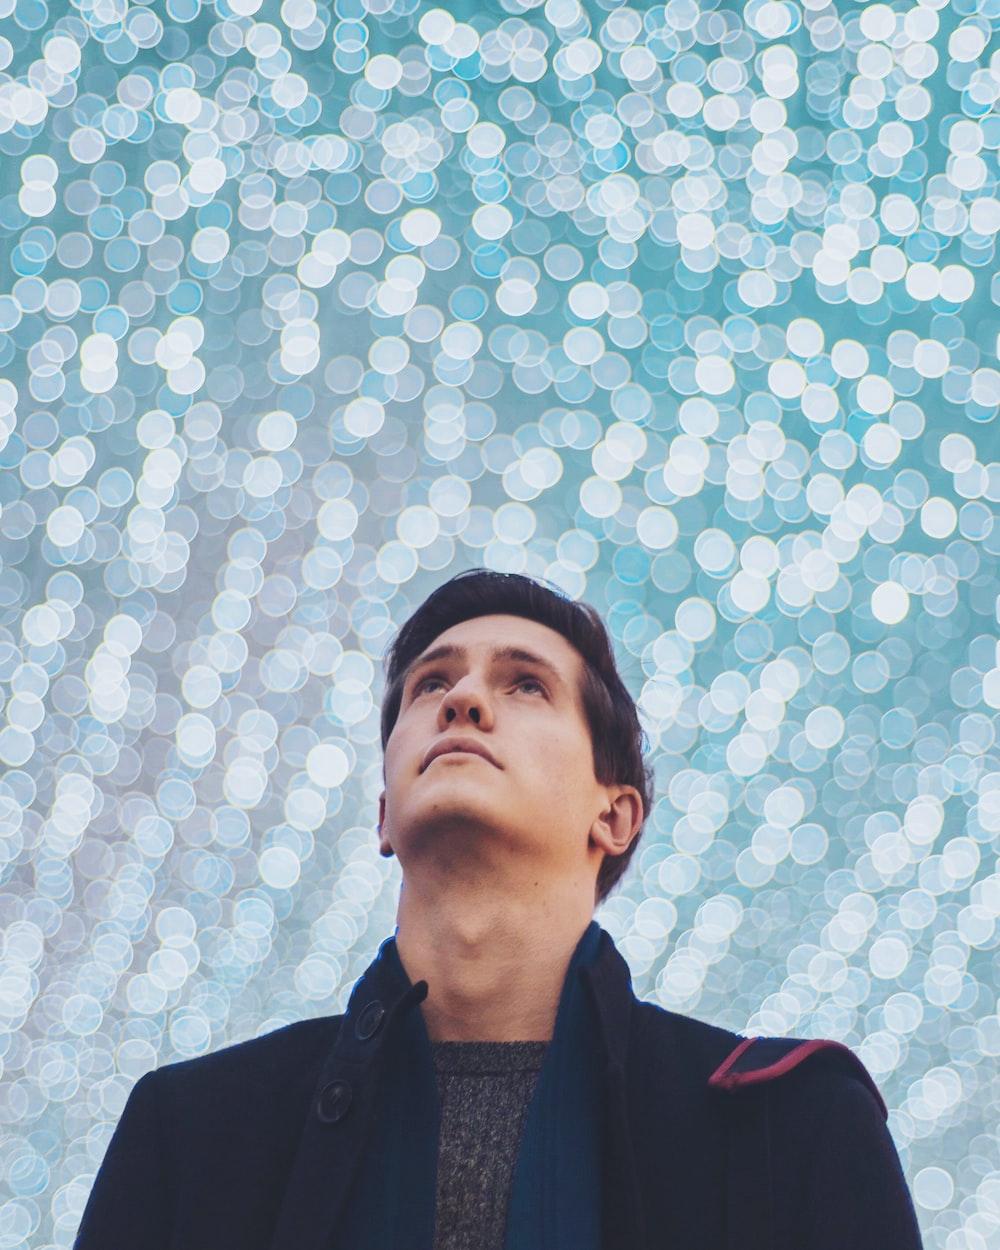 man in black coat looking up